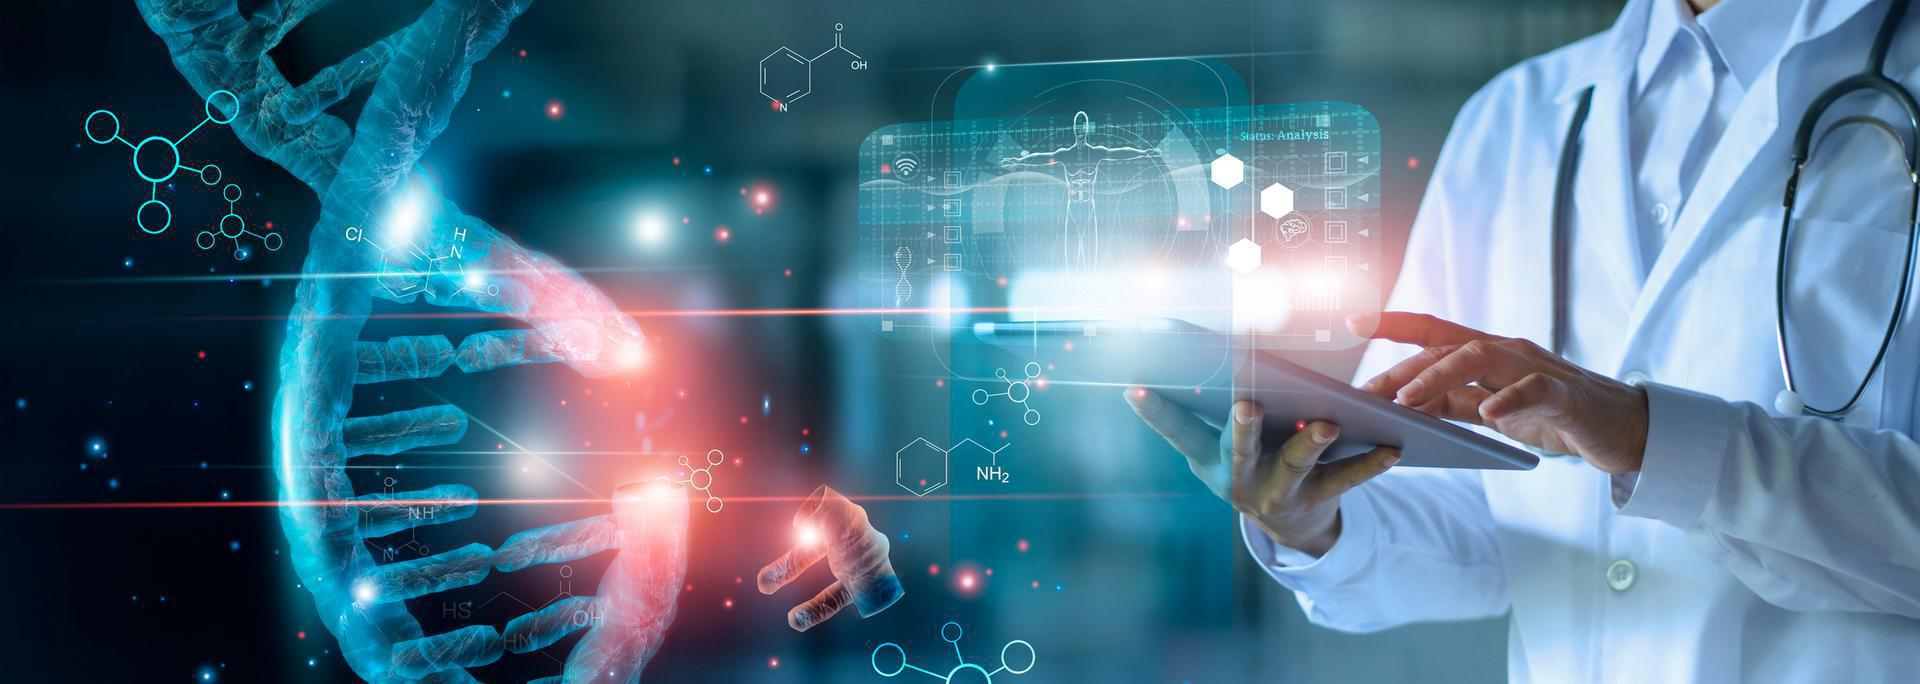 Drug Testing and DNA Testing - Vandalia MO - featured